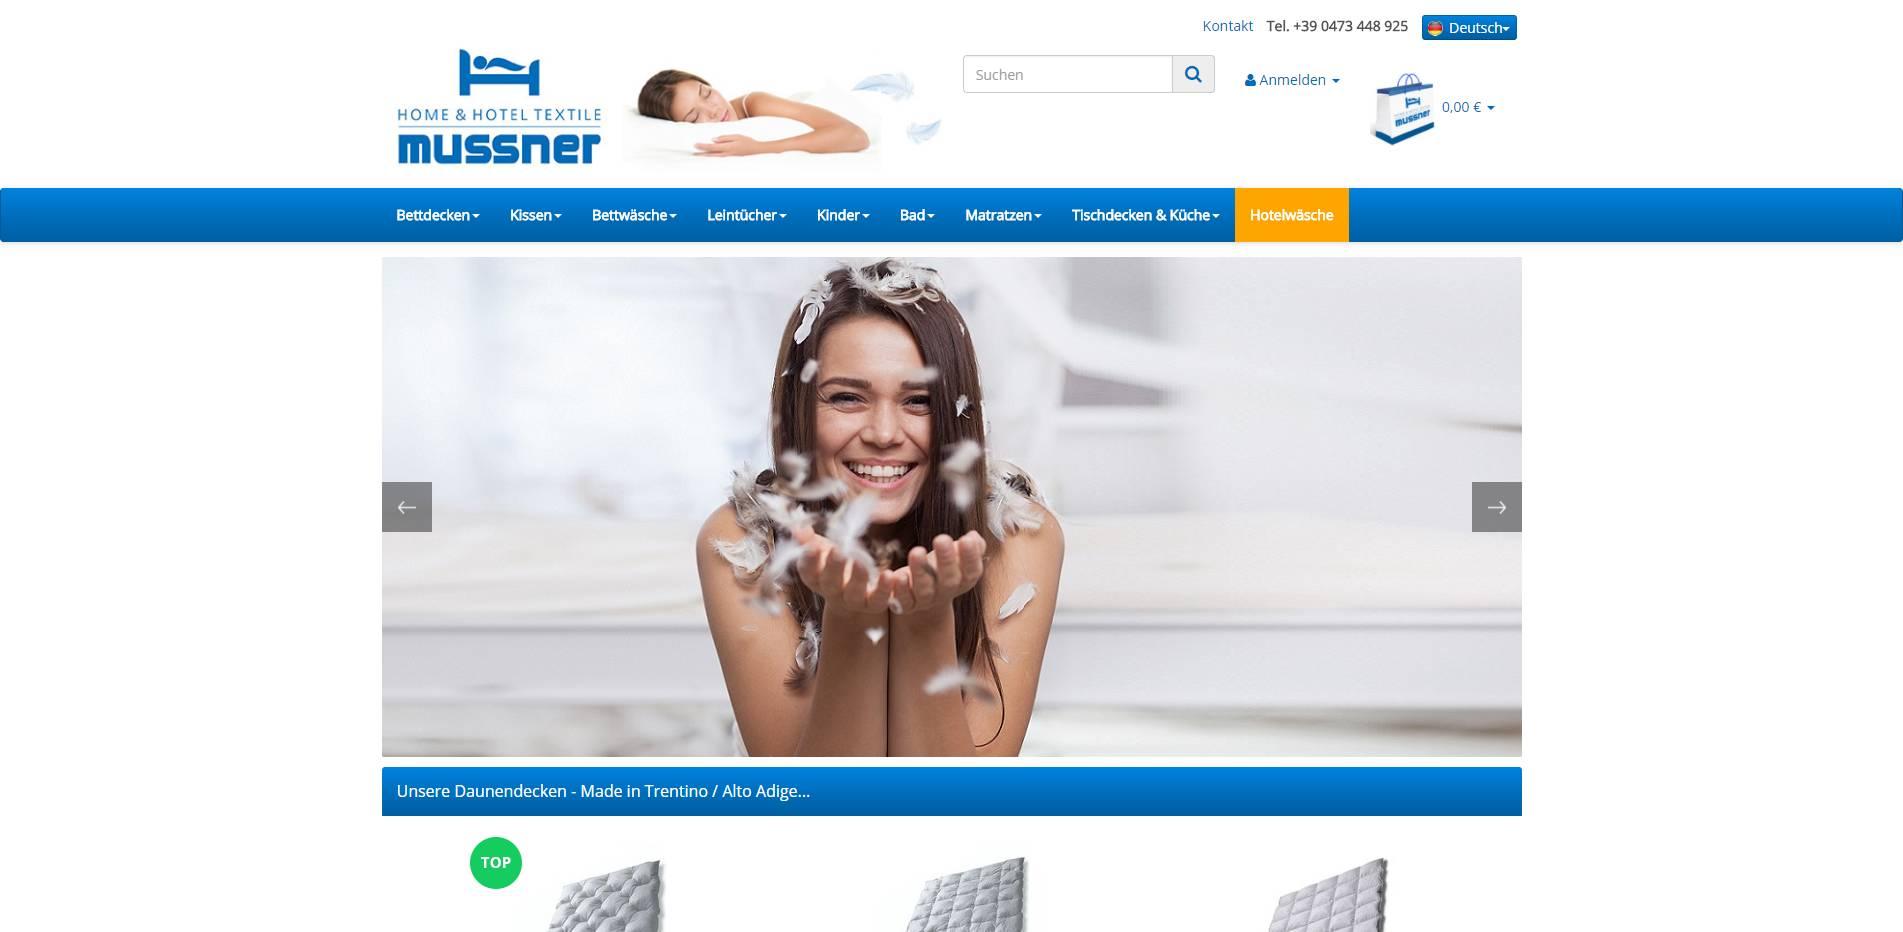 mussner.com